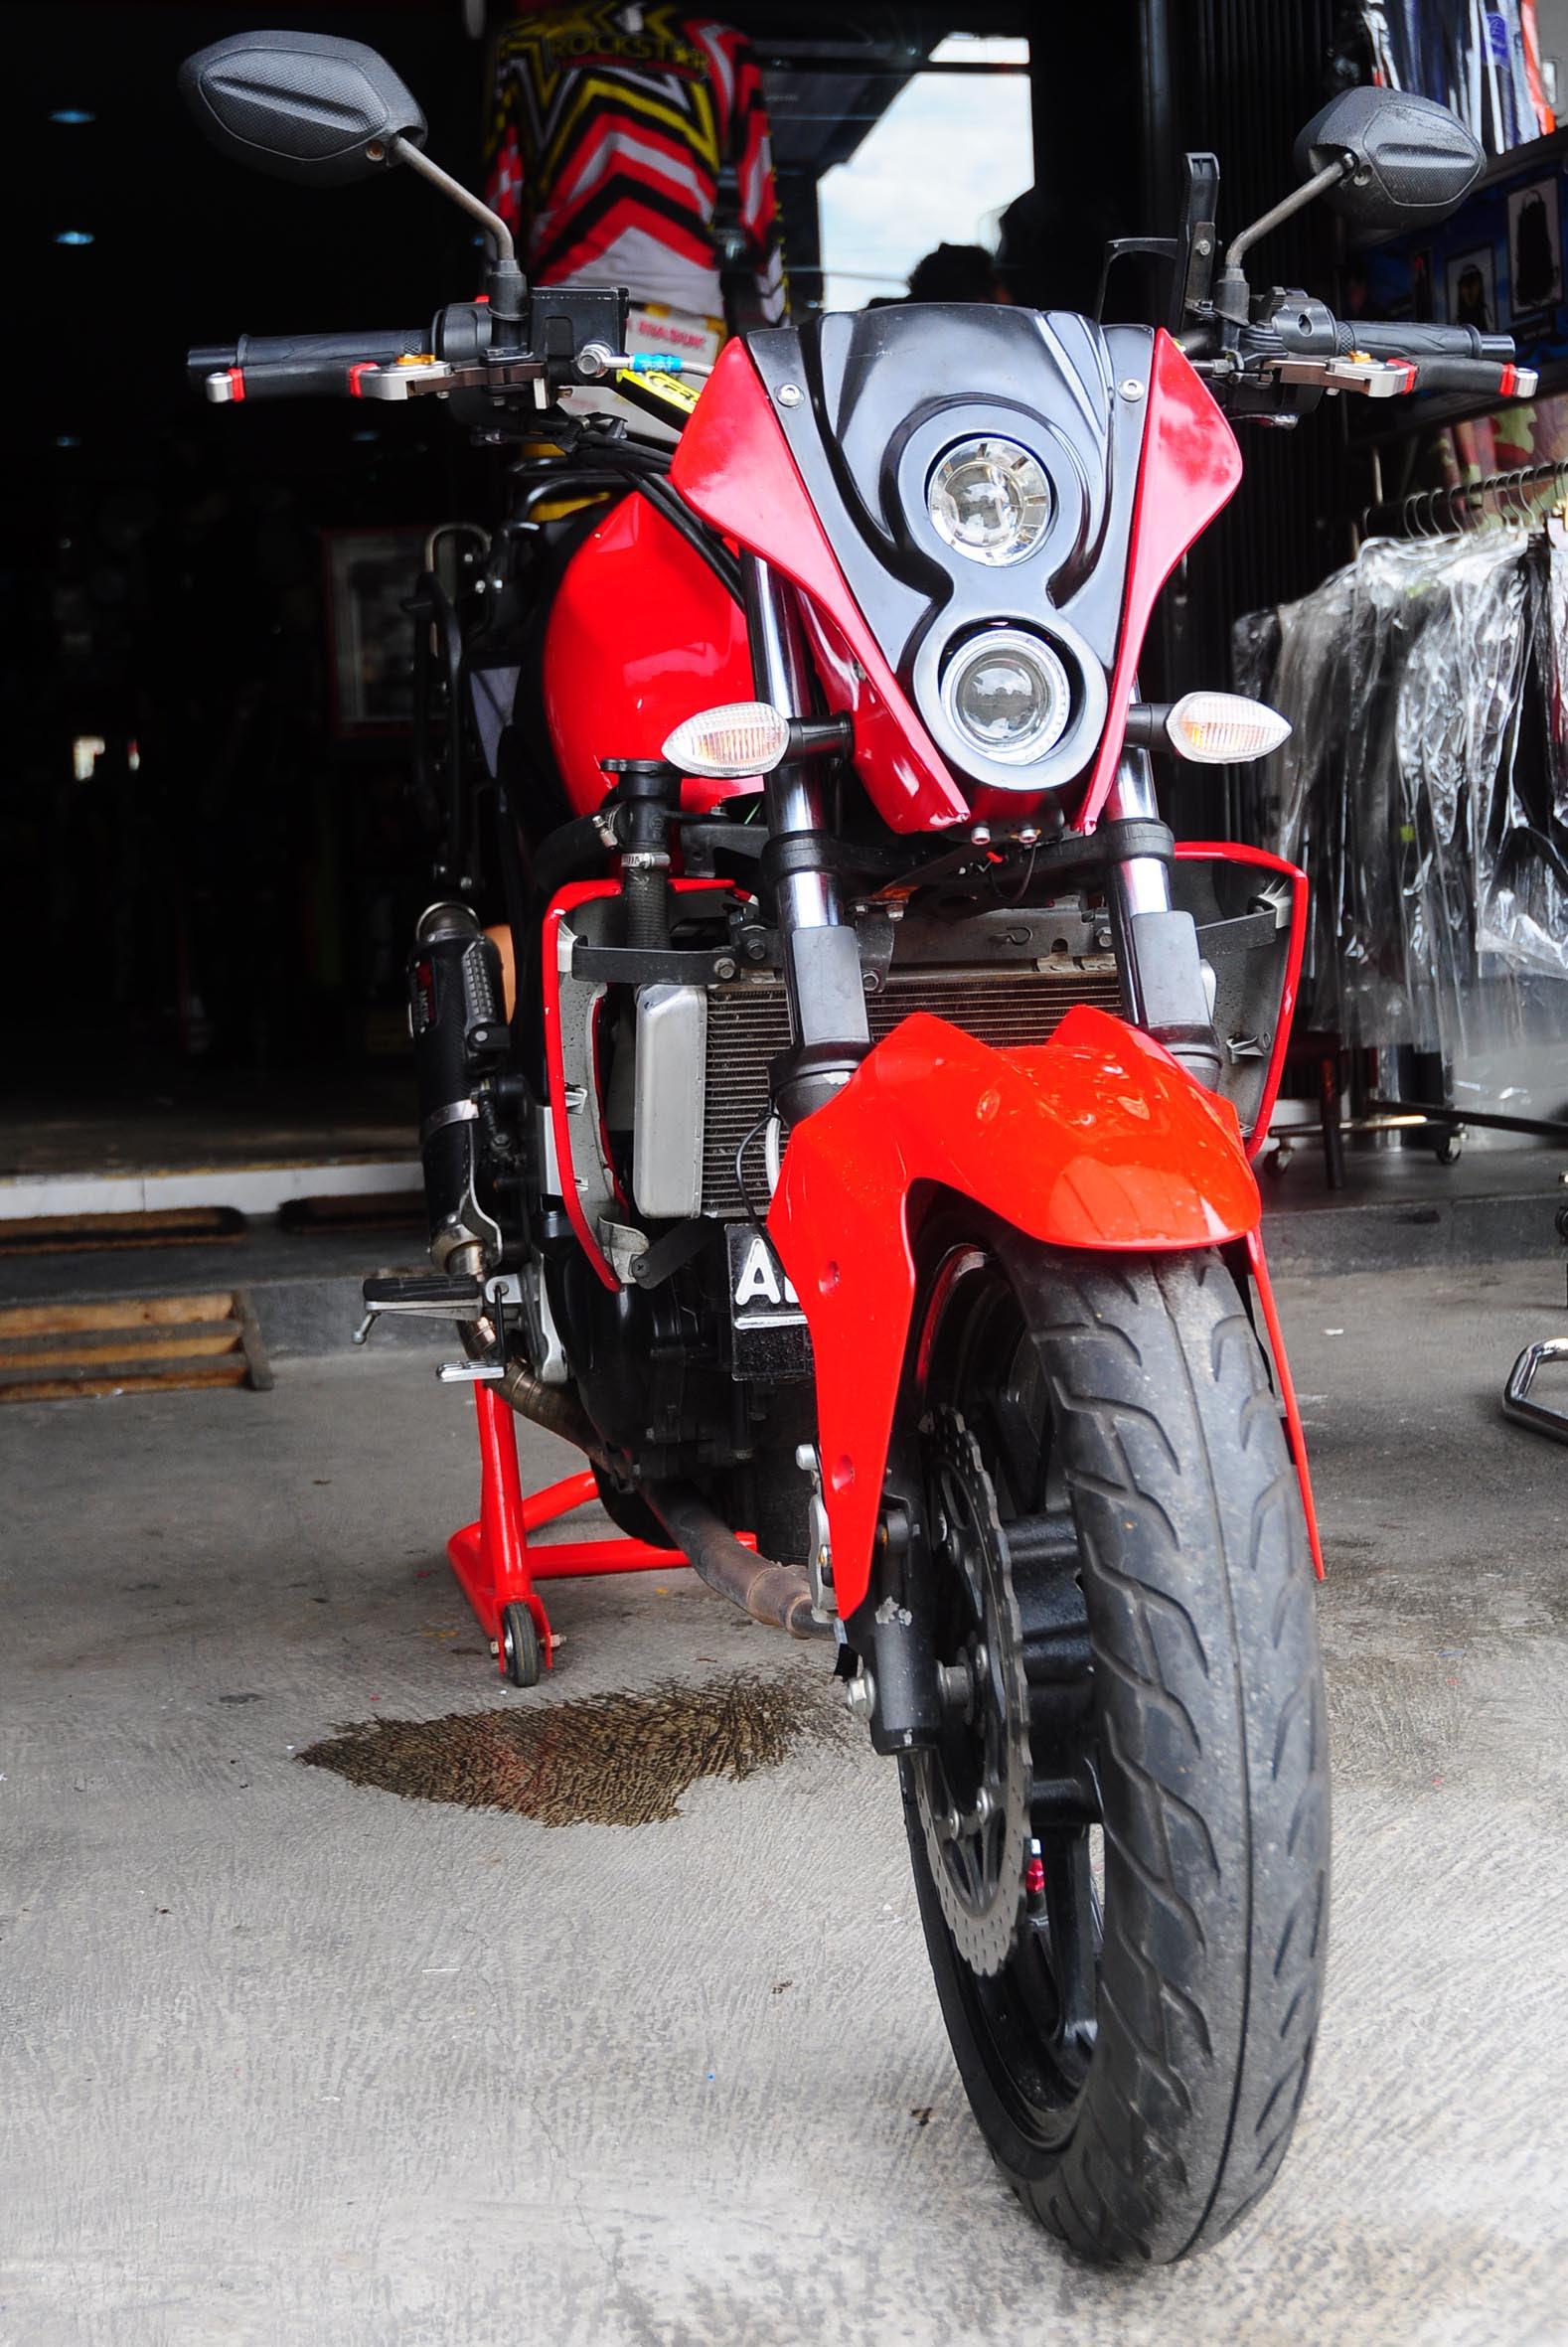 88 Modifikasi Motor Vixion Kap Ninja Terbaru Dan Terlengkap Kinyis